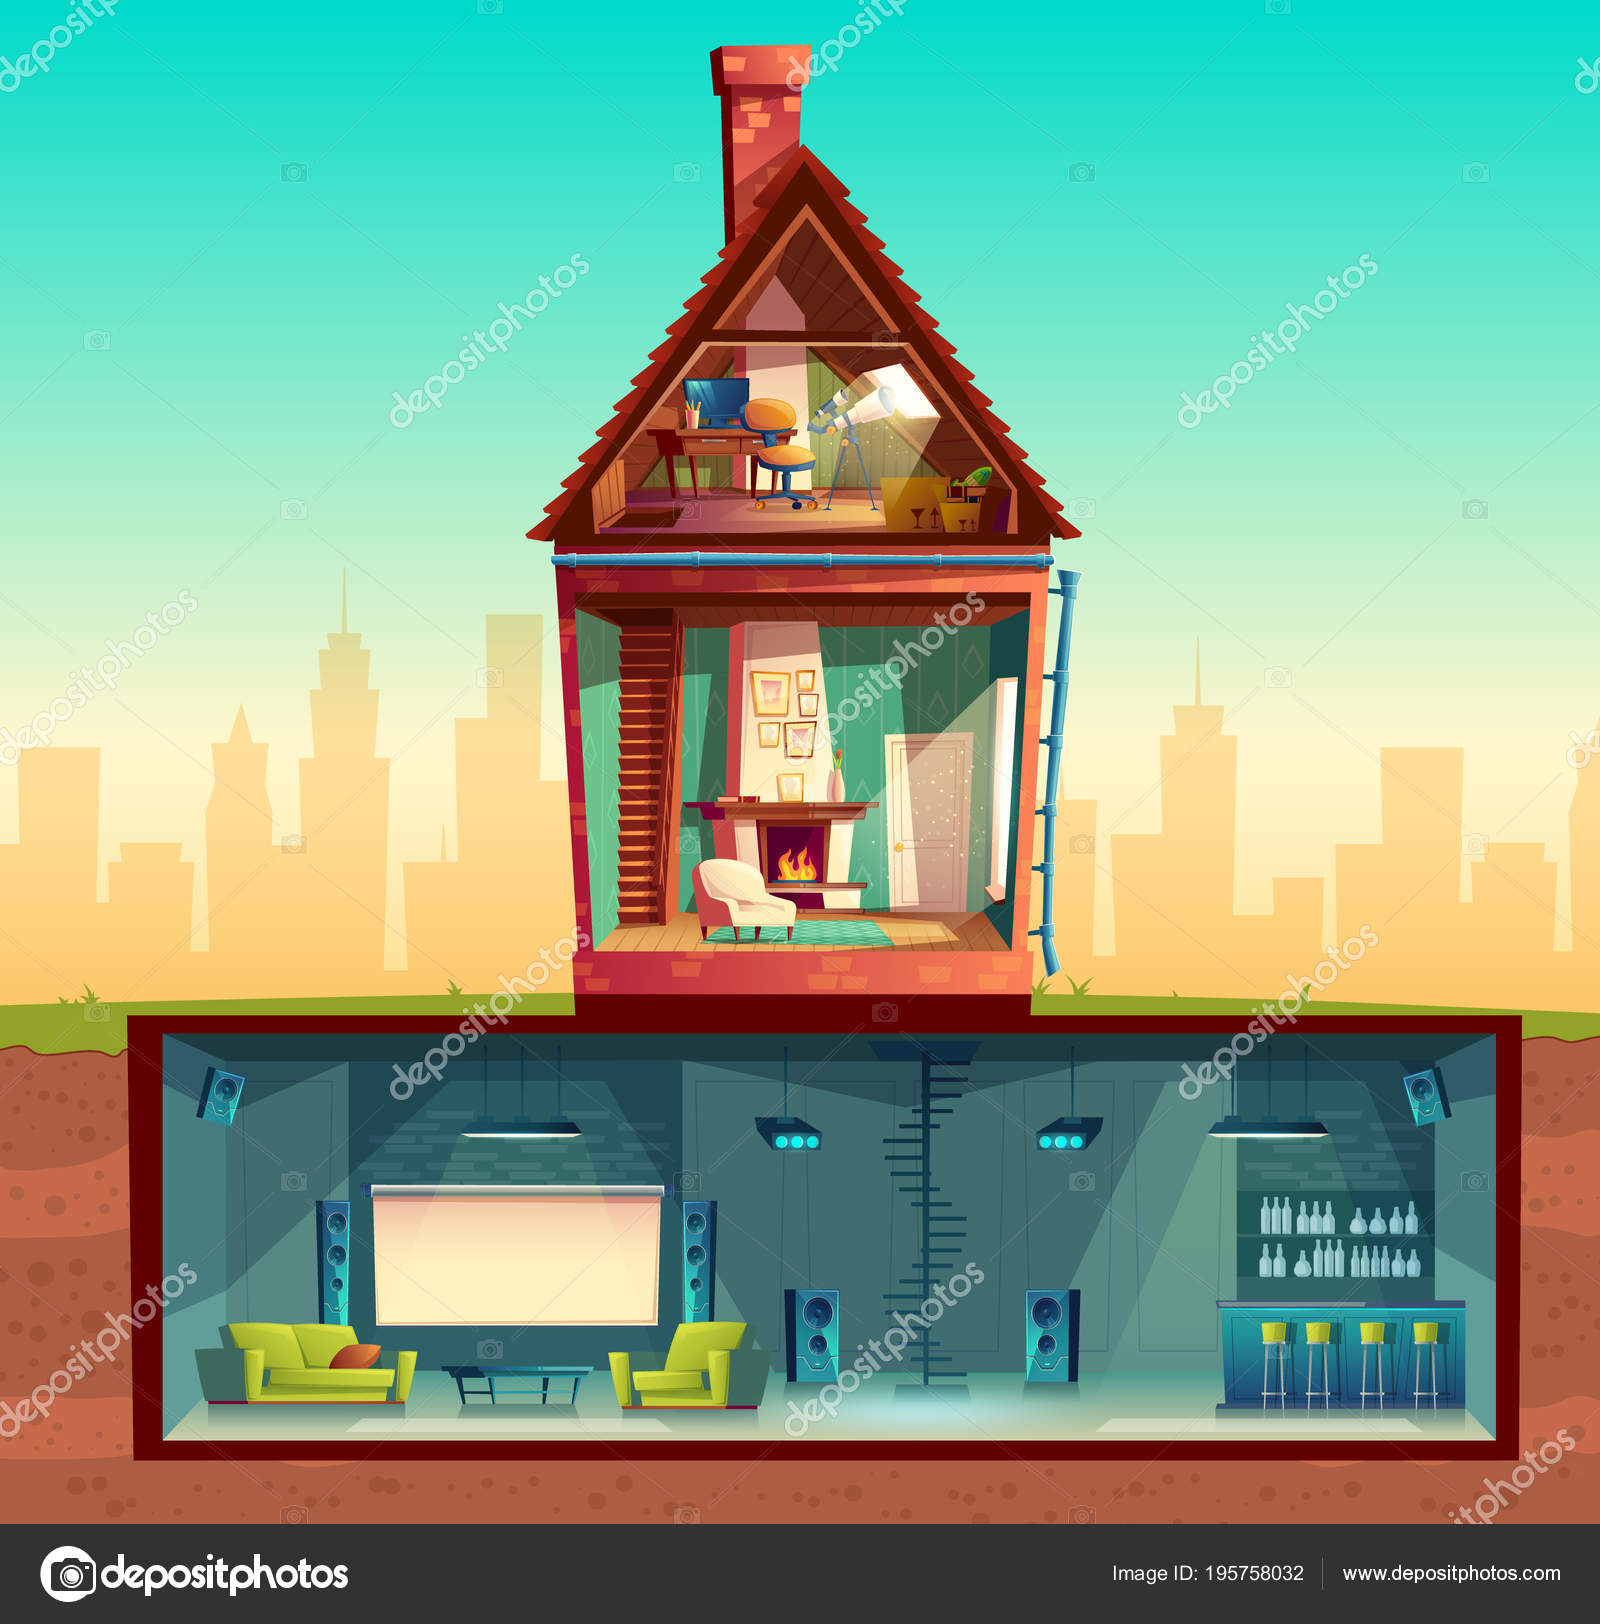 Vektor-Haus im Querschnitt, Keller, Dachboden — Stockvektor ...